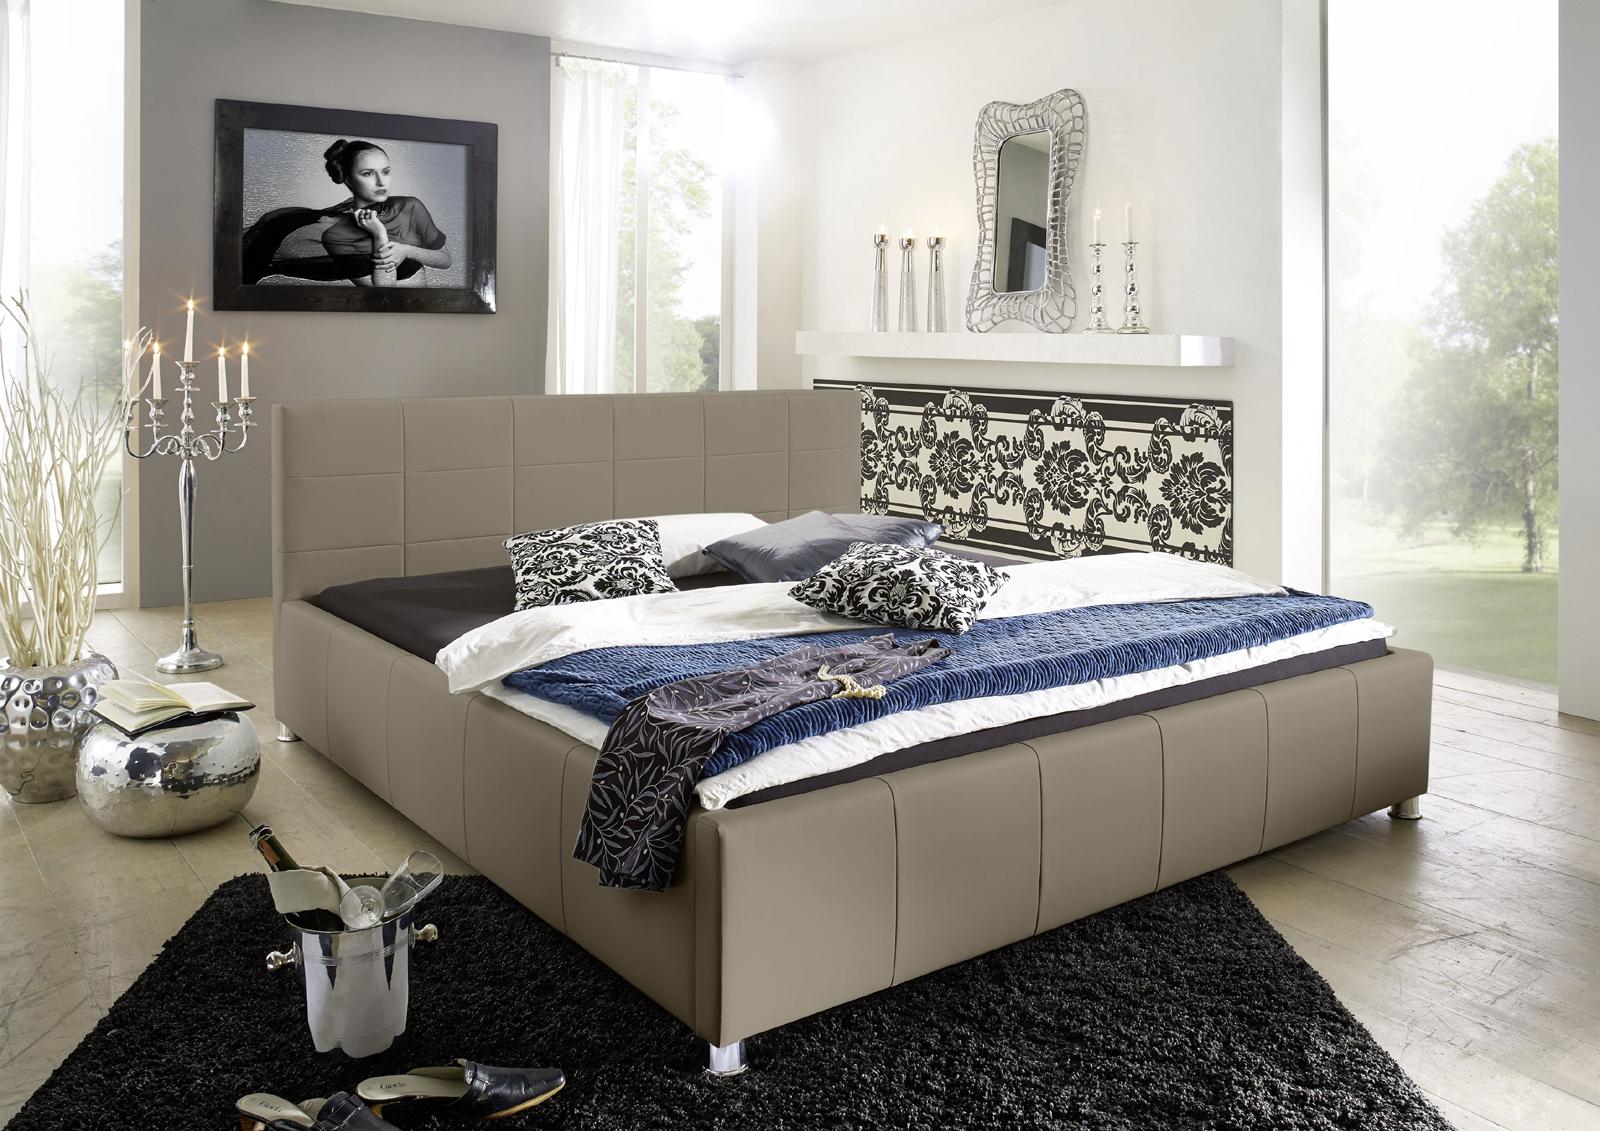 sam design bett 100 x 200 cm muddy kira g nstig. Black Bedroom Furniture Sets. Home Design Ideas